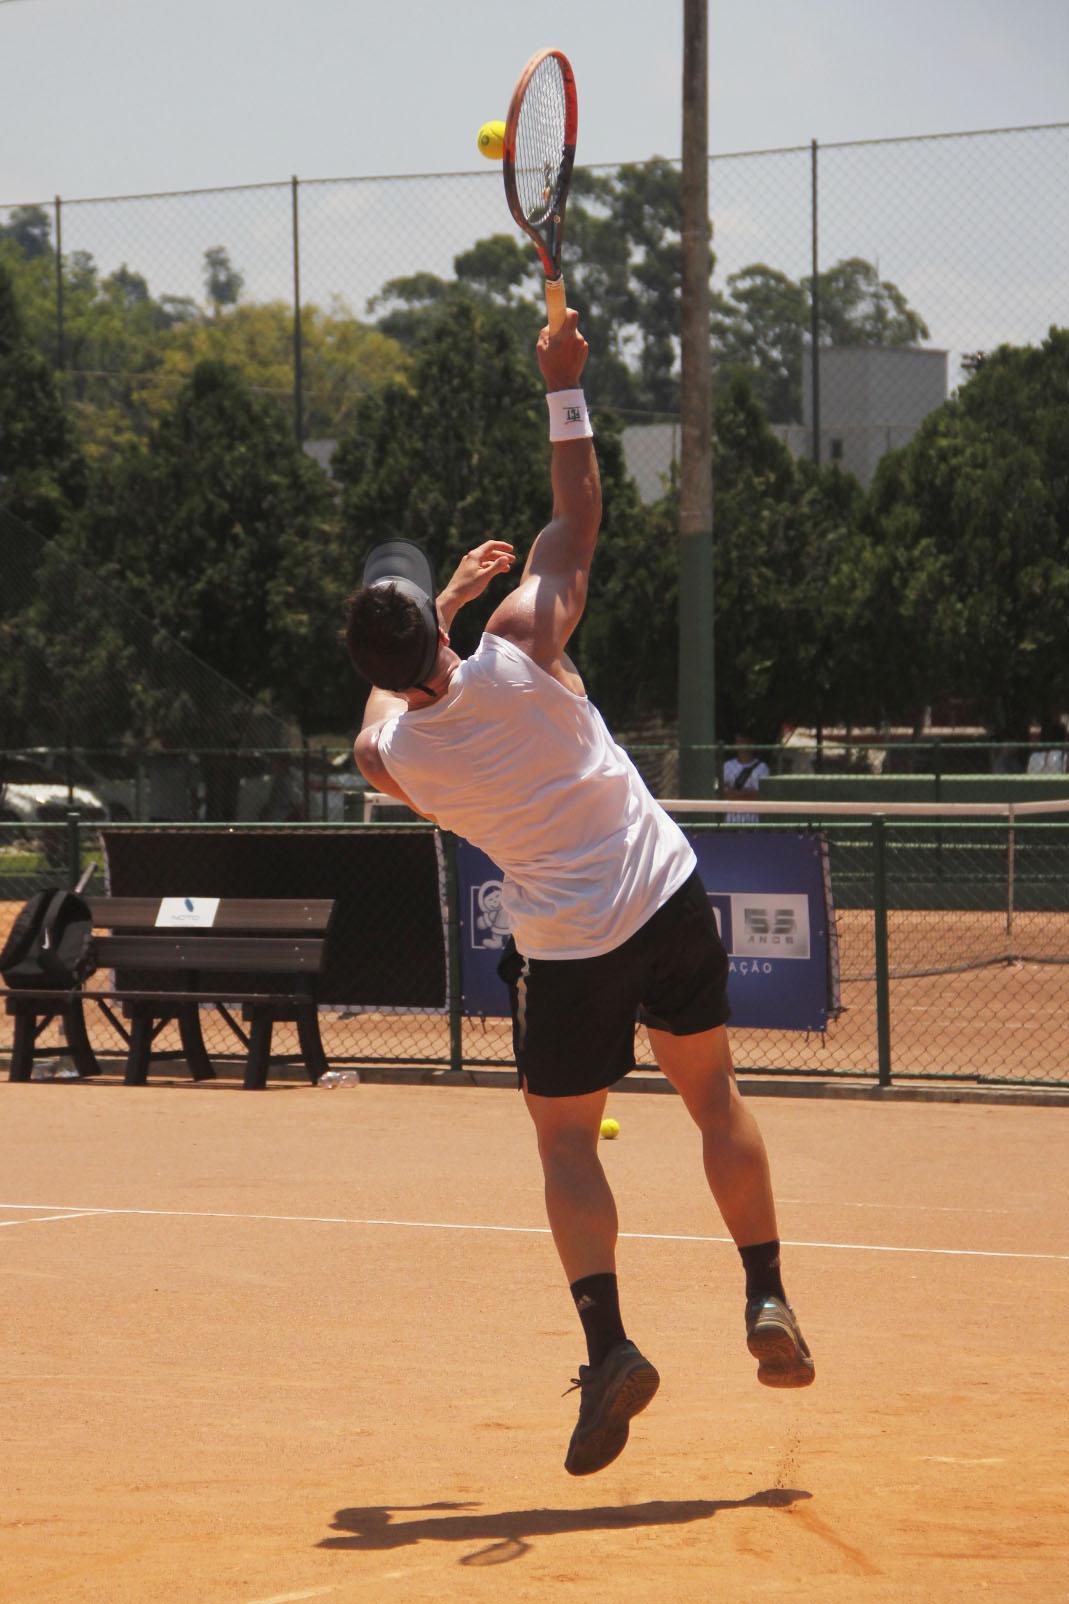 Copa Abertura FCT de Tênis 2019 terá mais de 420 participantes